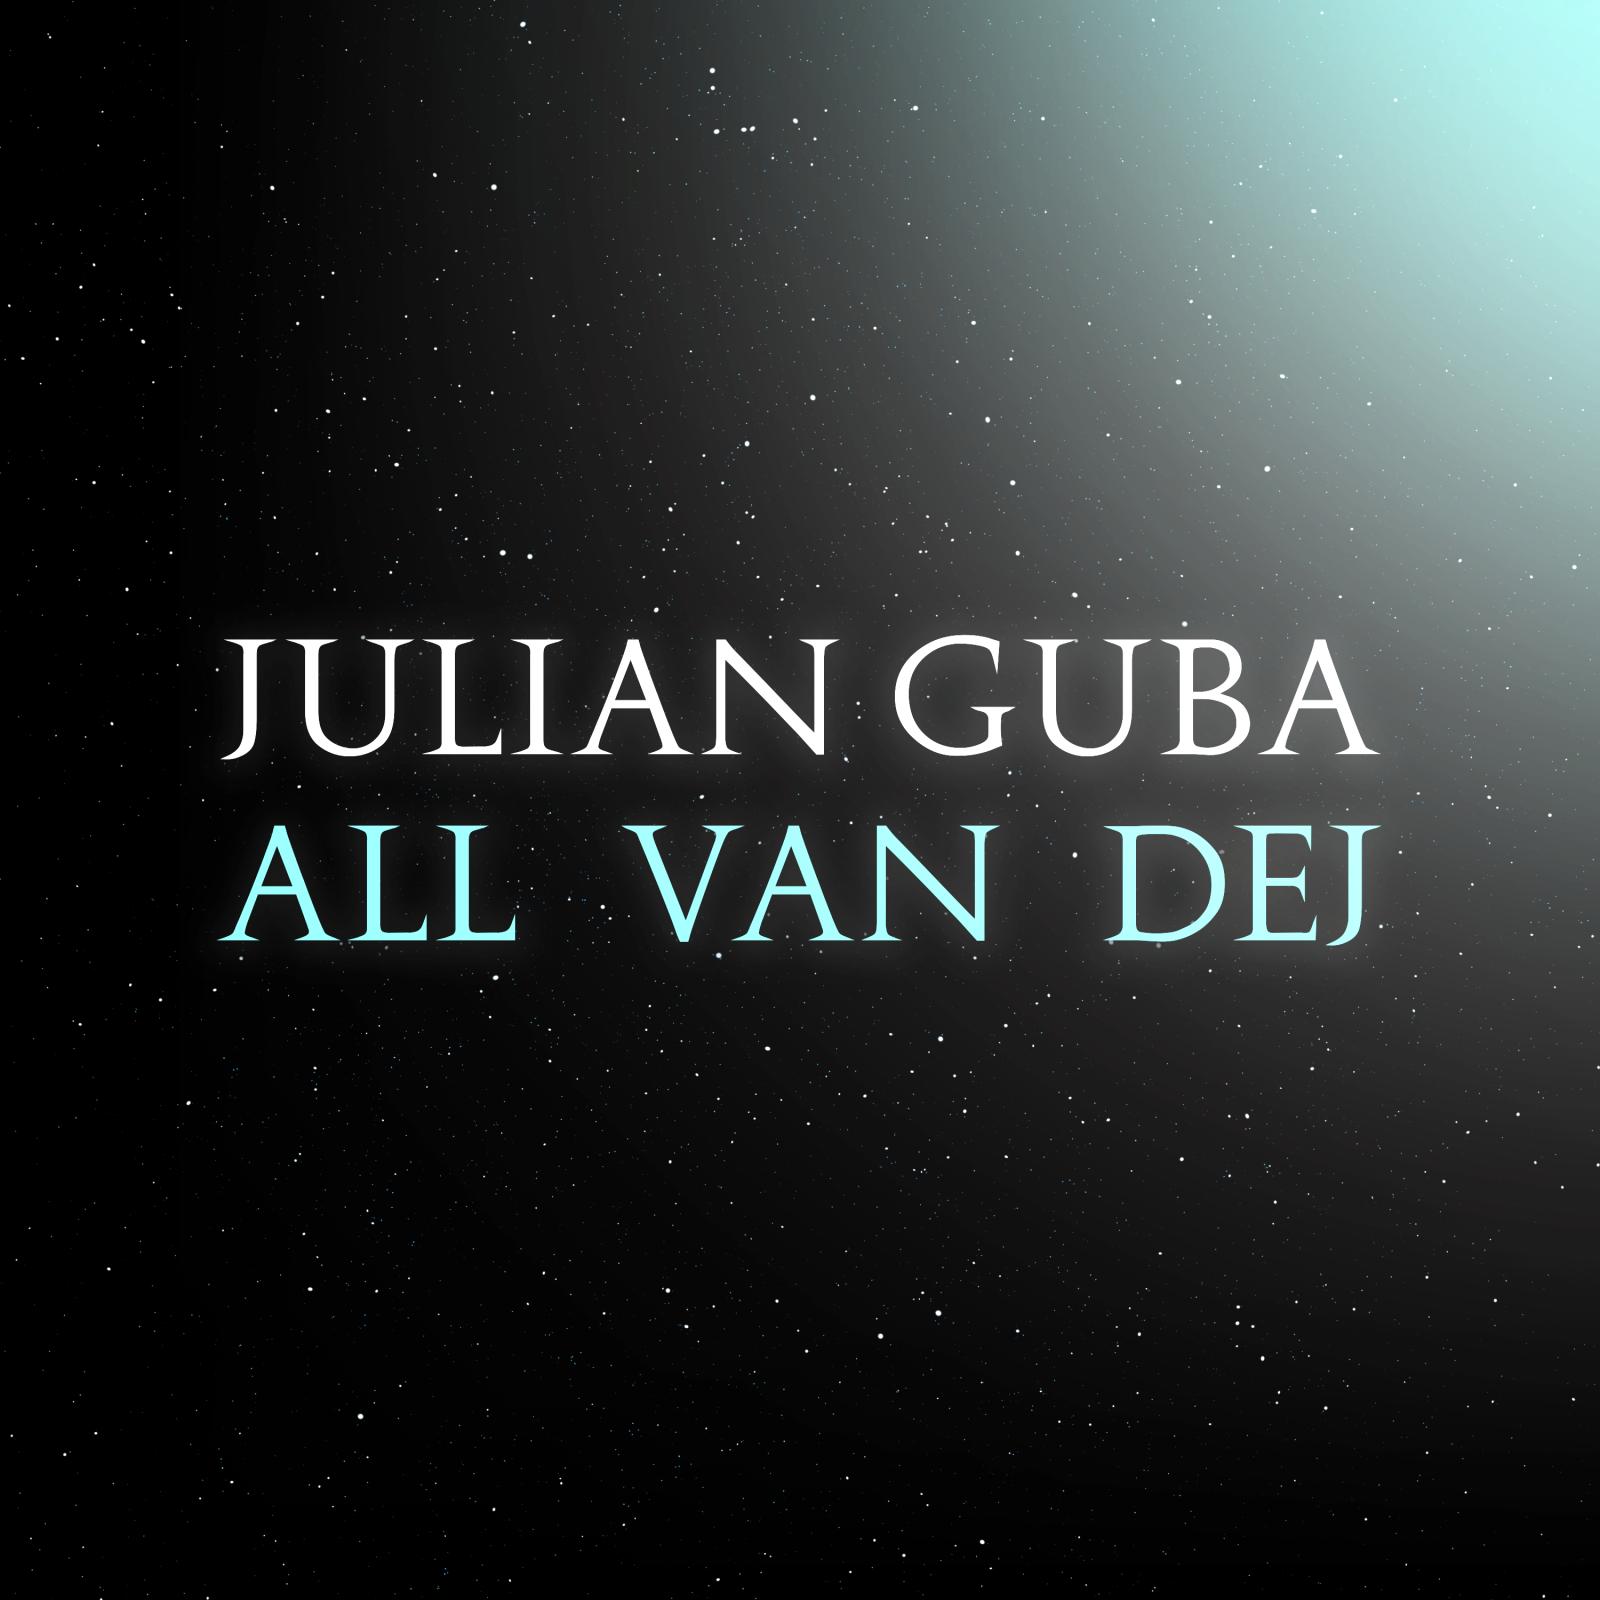 All Van Dej ⋆ Julian Guba ⋆ ©2019, listed on all major music platforms